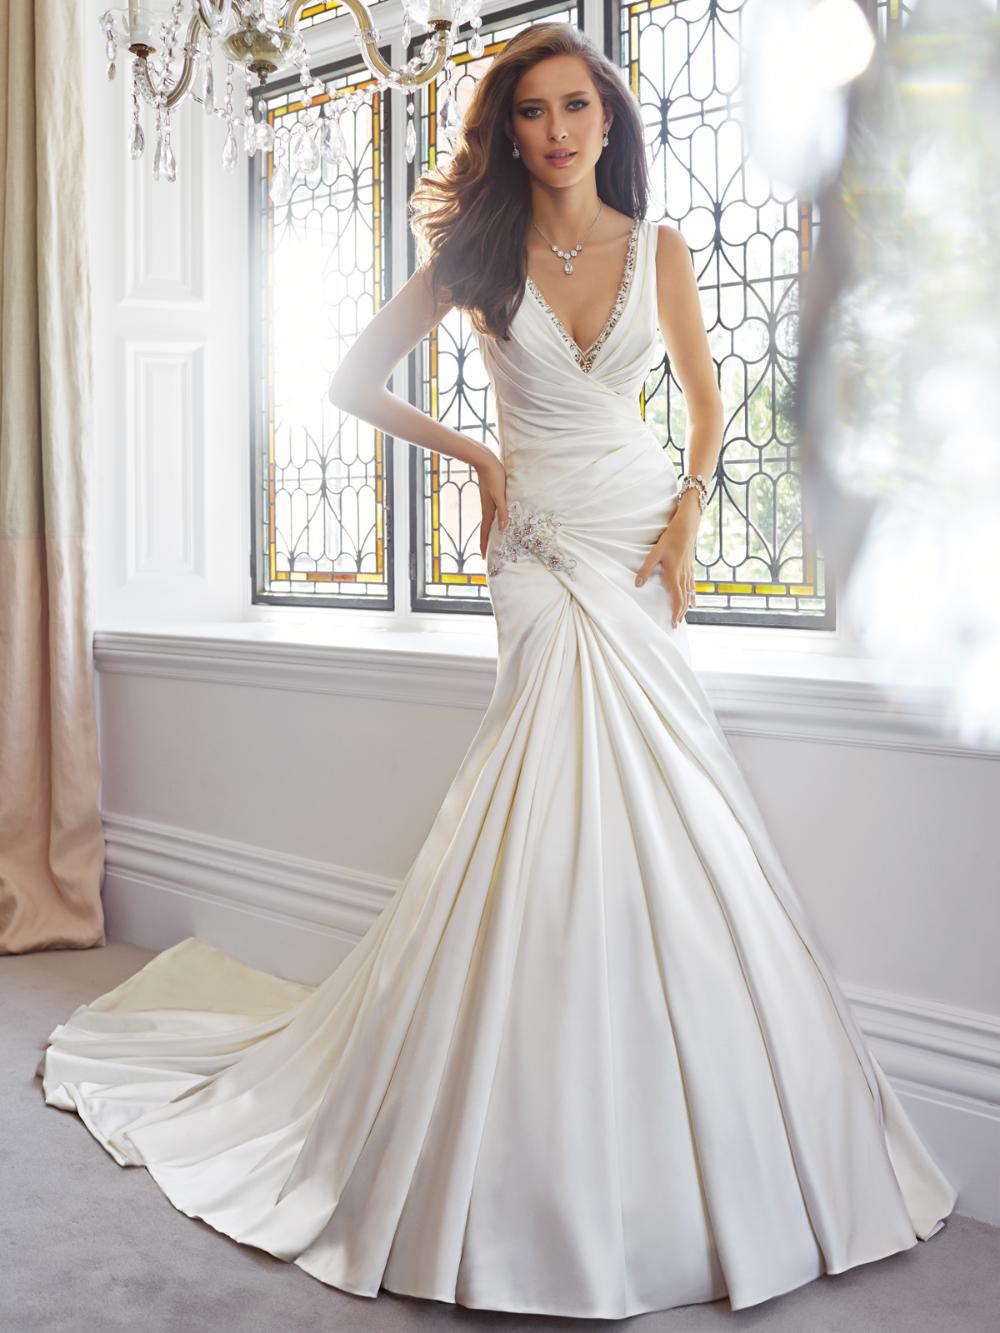 Sophia Tolli Wedding Dresses Prices Uk Lixnet Ag Sophia Tolli Wedding Dresses Bridal Dresses Wedding Dresses Satin